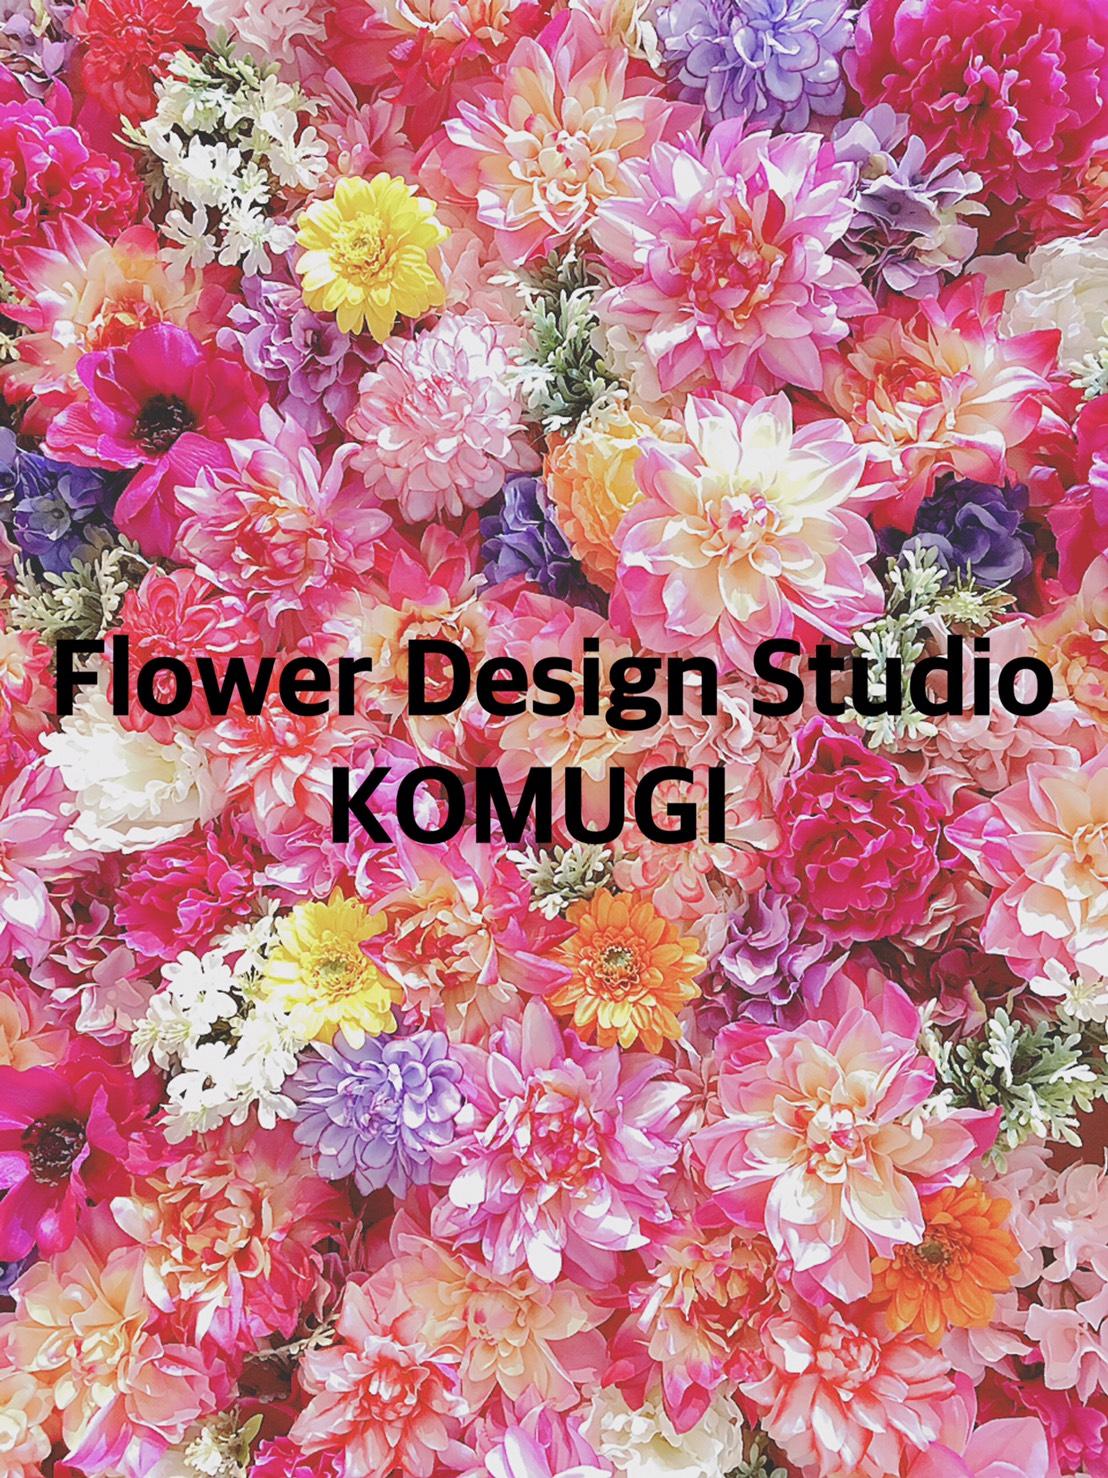 Flower Design Studio KOMUGI